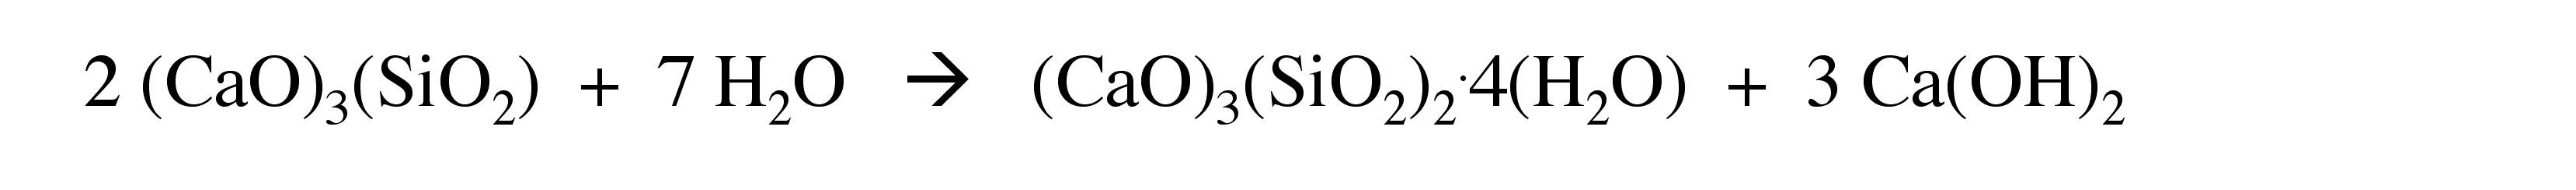 chemical equation for water and calcium oxide tessshebaylo. Black Bedroom Furniture Sets. Home Design Ideas